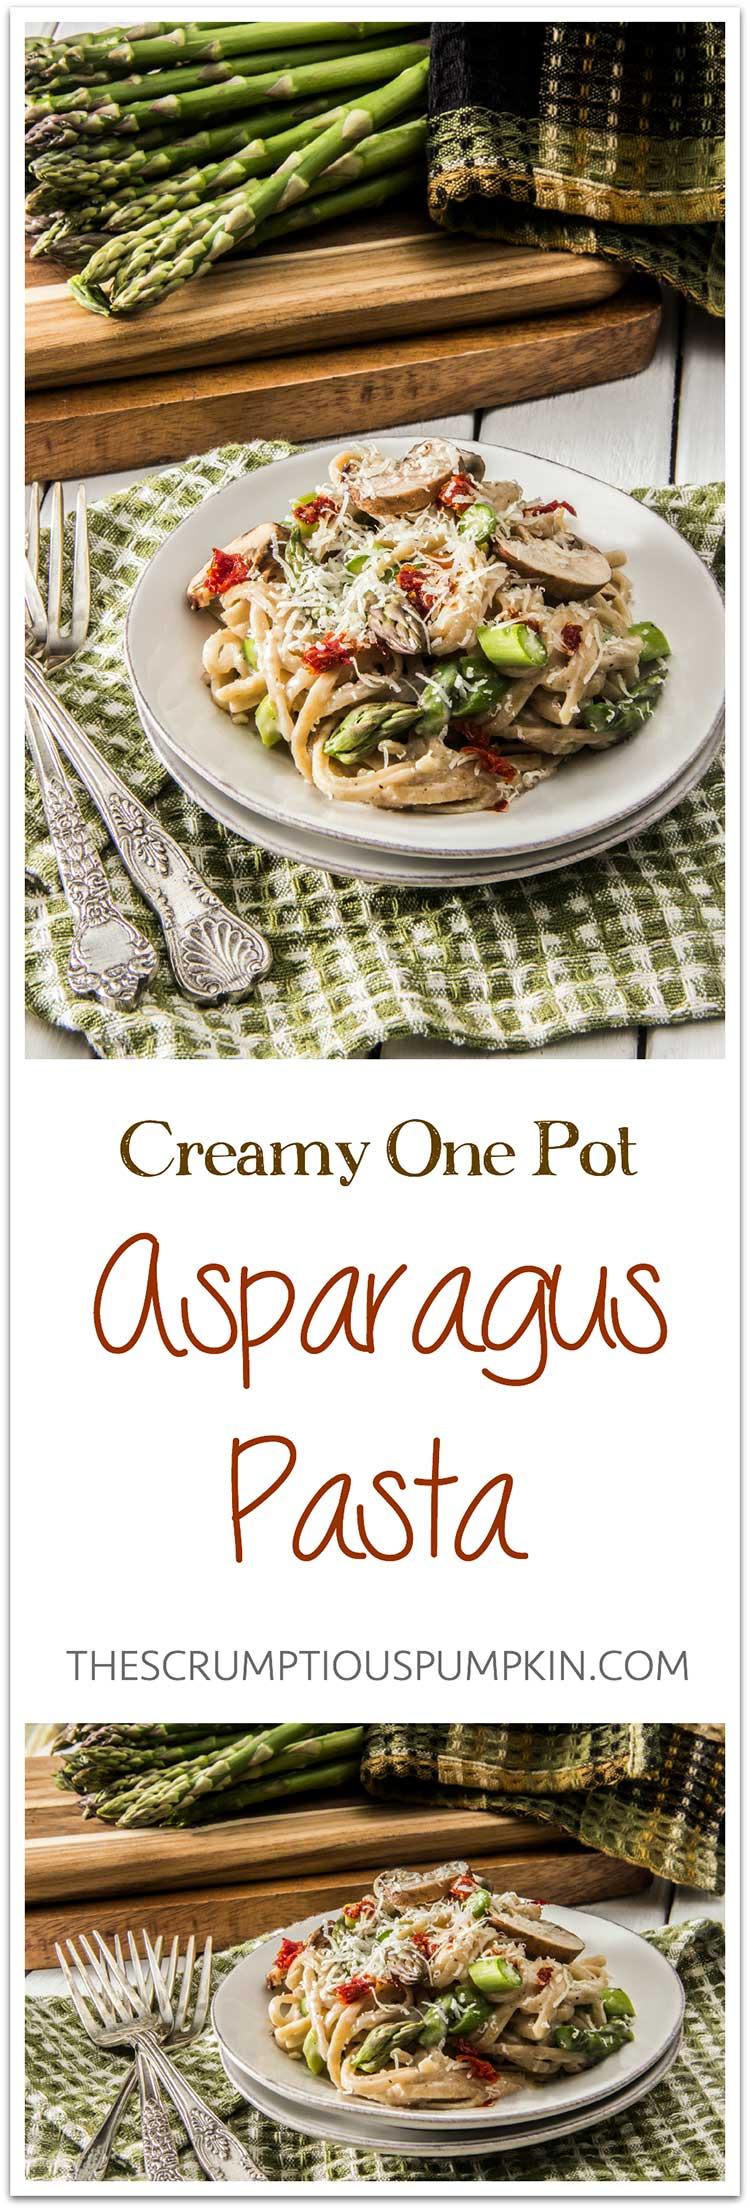 Creamy-One-Pot-Asparagus-Pasta